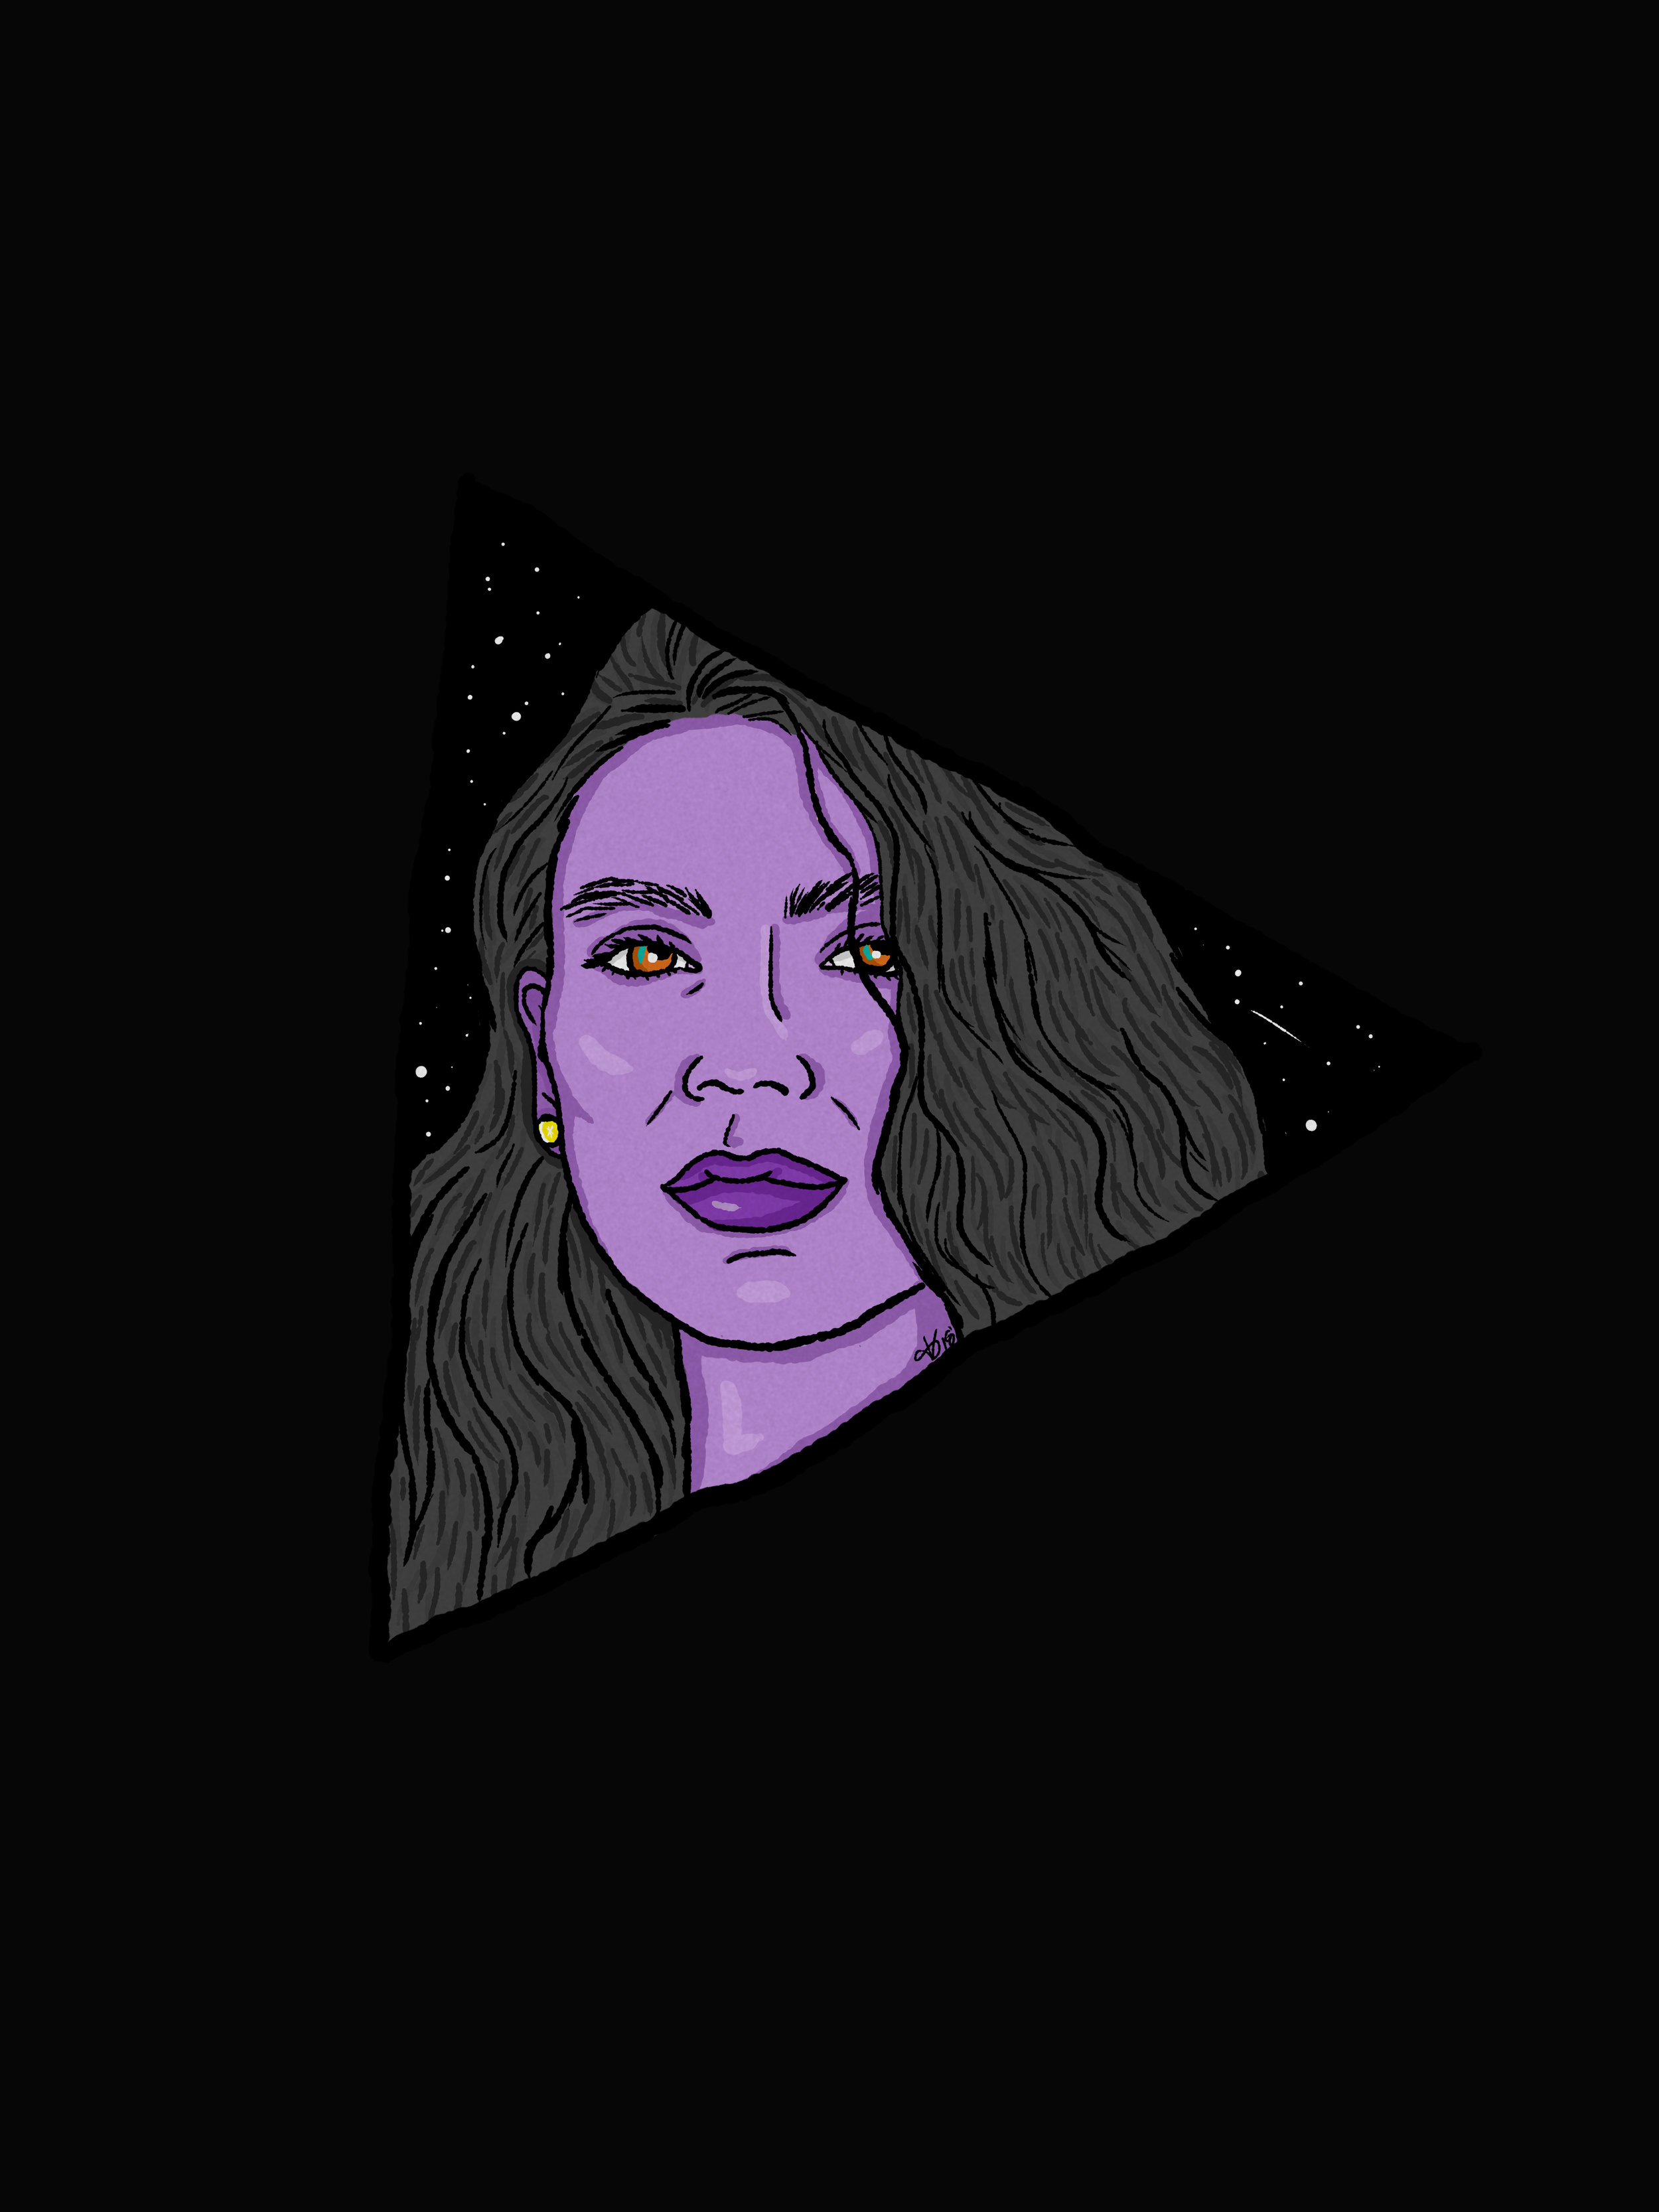 triangle-space.jpg